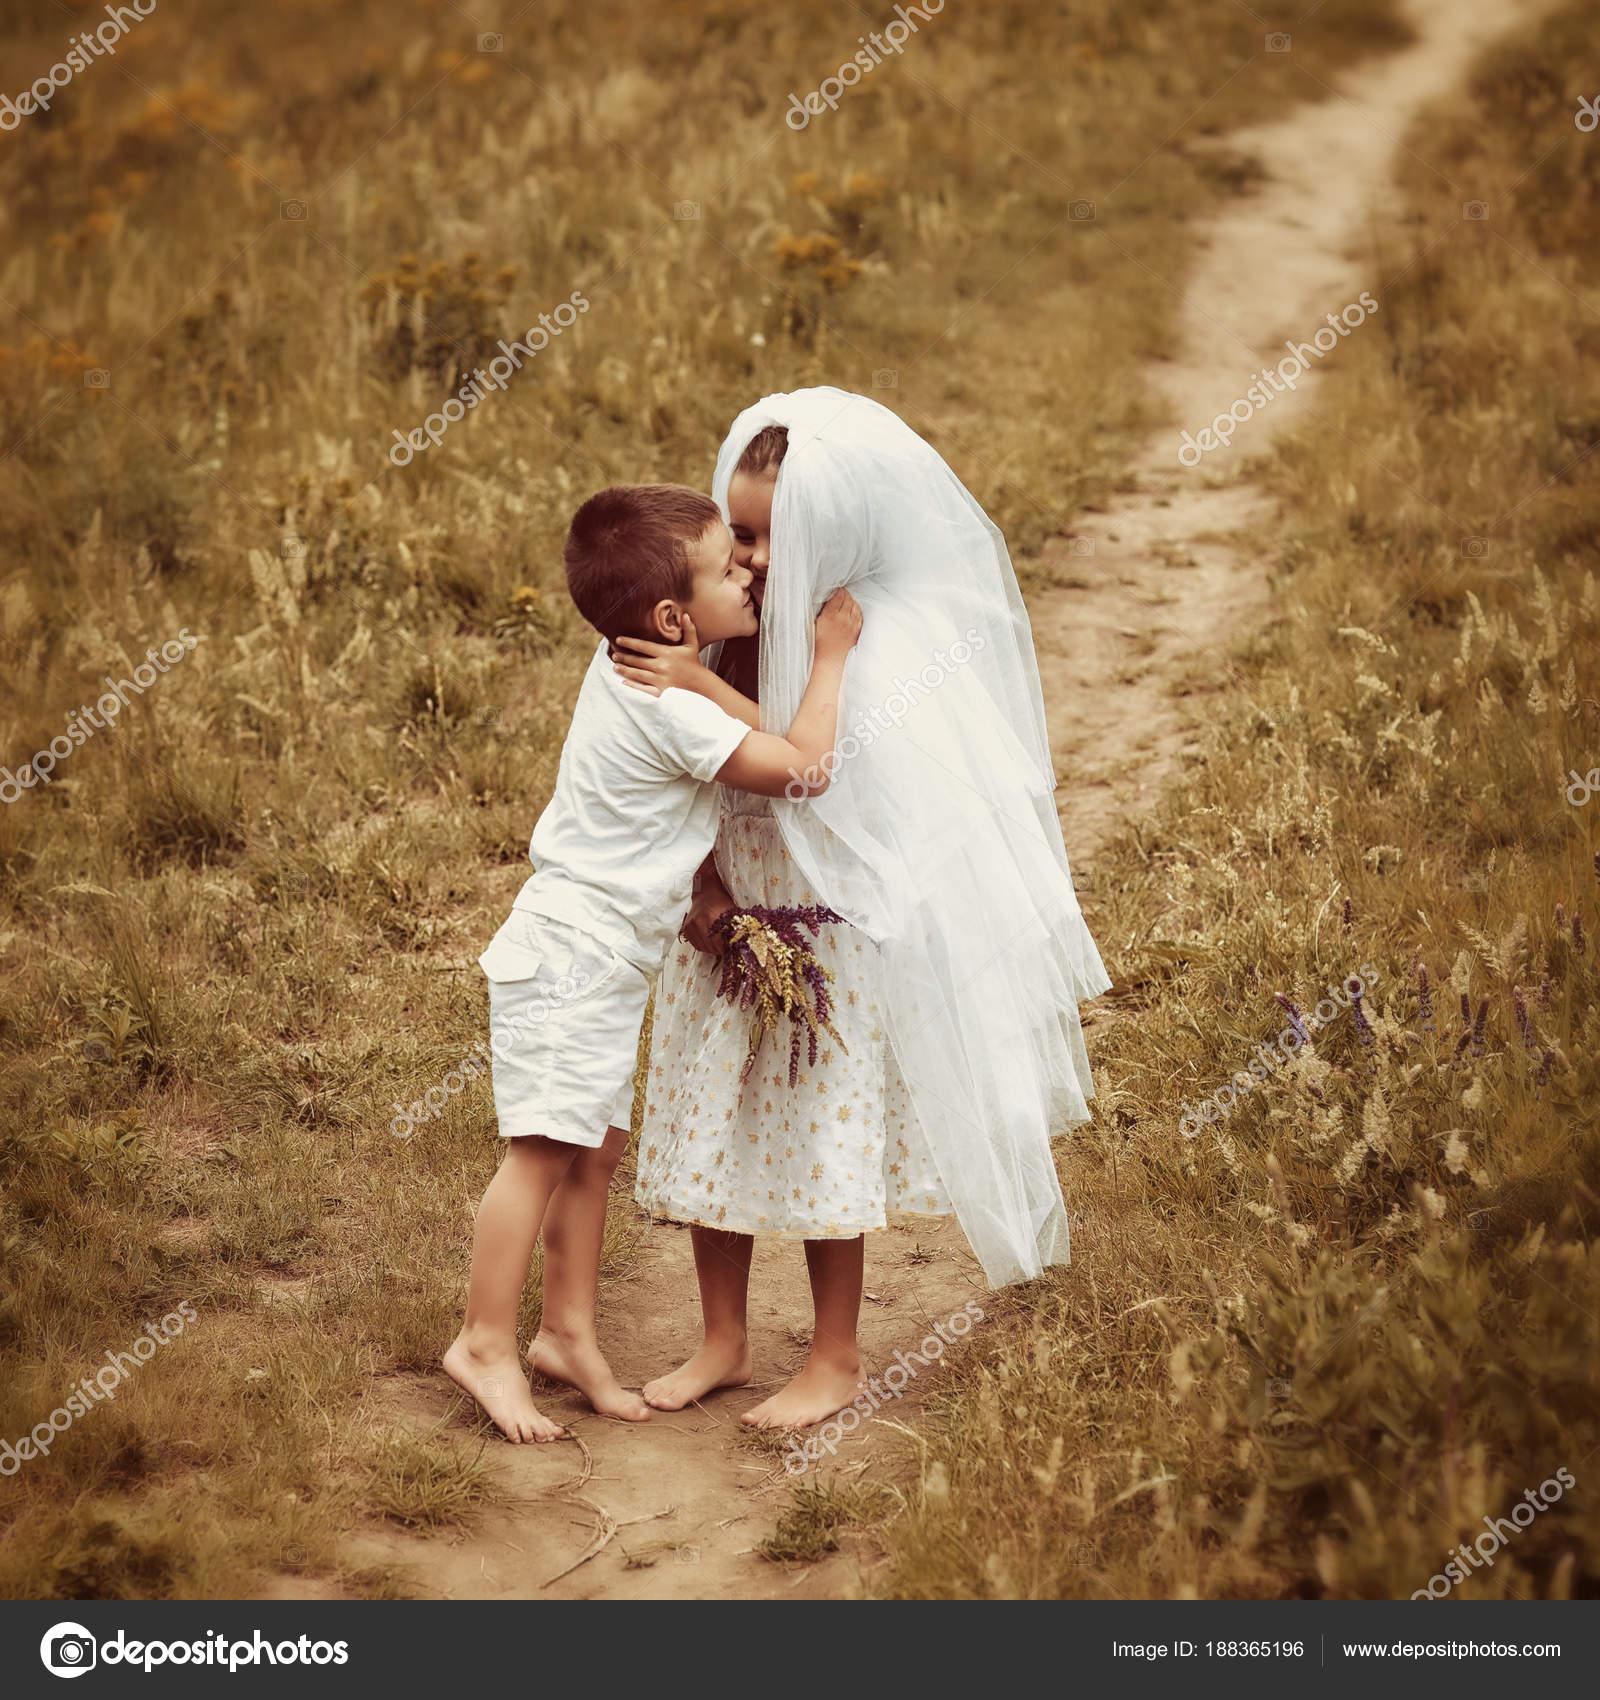 73e84af46fb9 Νέοι Νύφη και ο γαμπρός παίζοντας υπαίθριο γάμο το καλοκαίρι. Τα παιδιά σαν  νεόνυμφοι. Μικρό κορίτσι στο φόρεμα νύφη άσπρη και νυφικό πέπλο φιλιά μικρό  ...